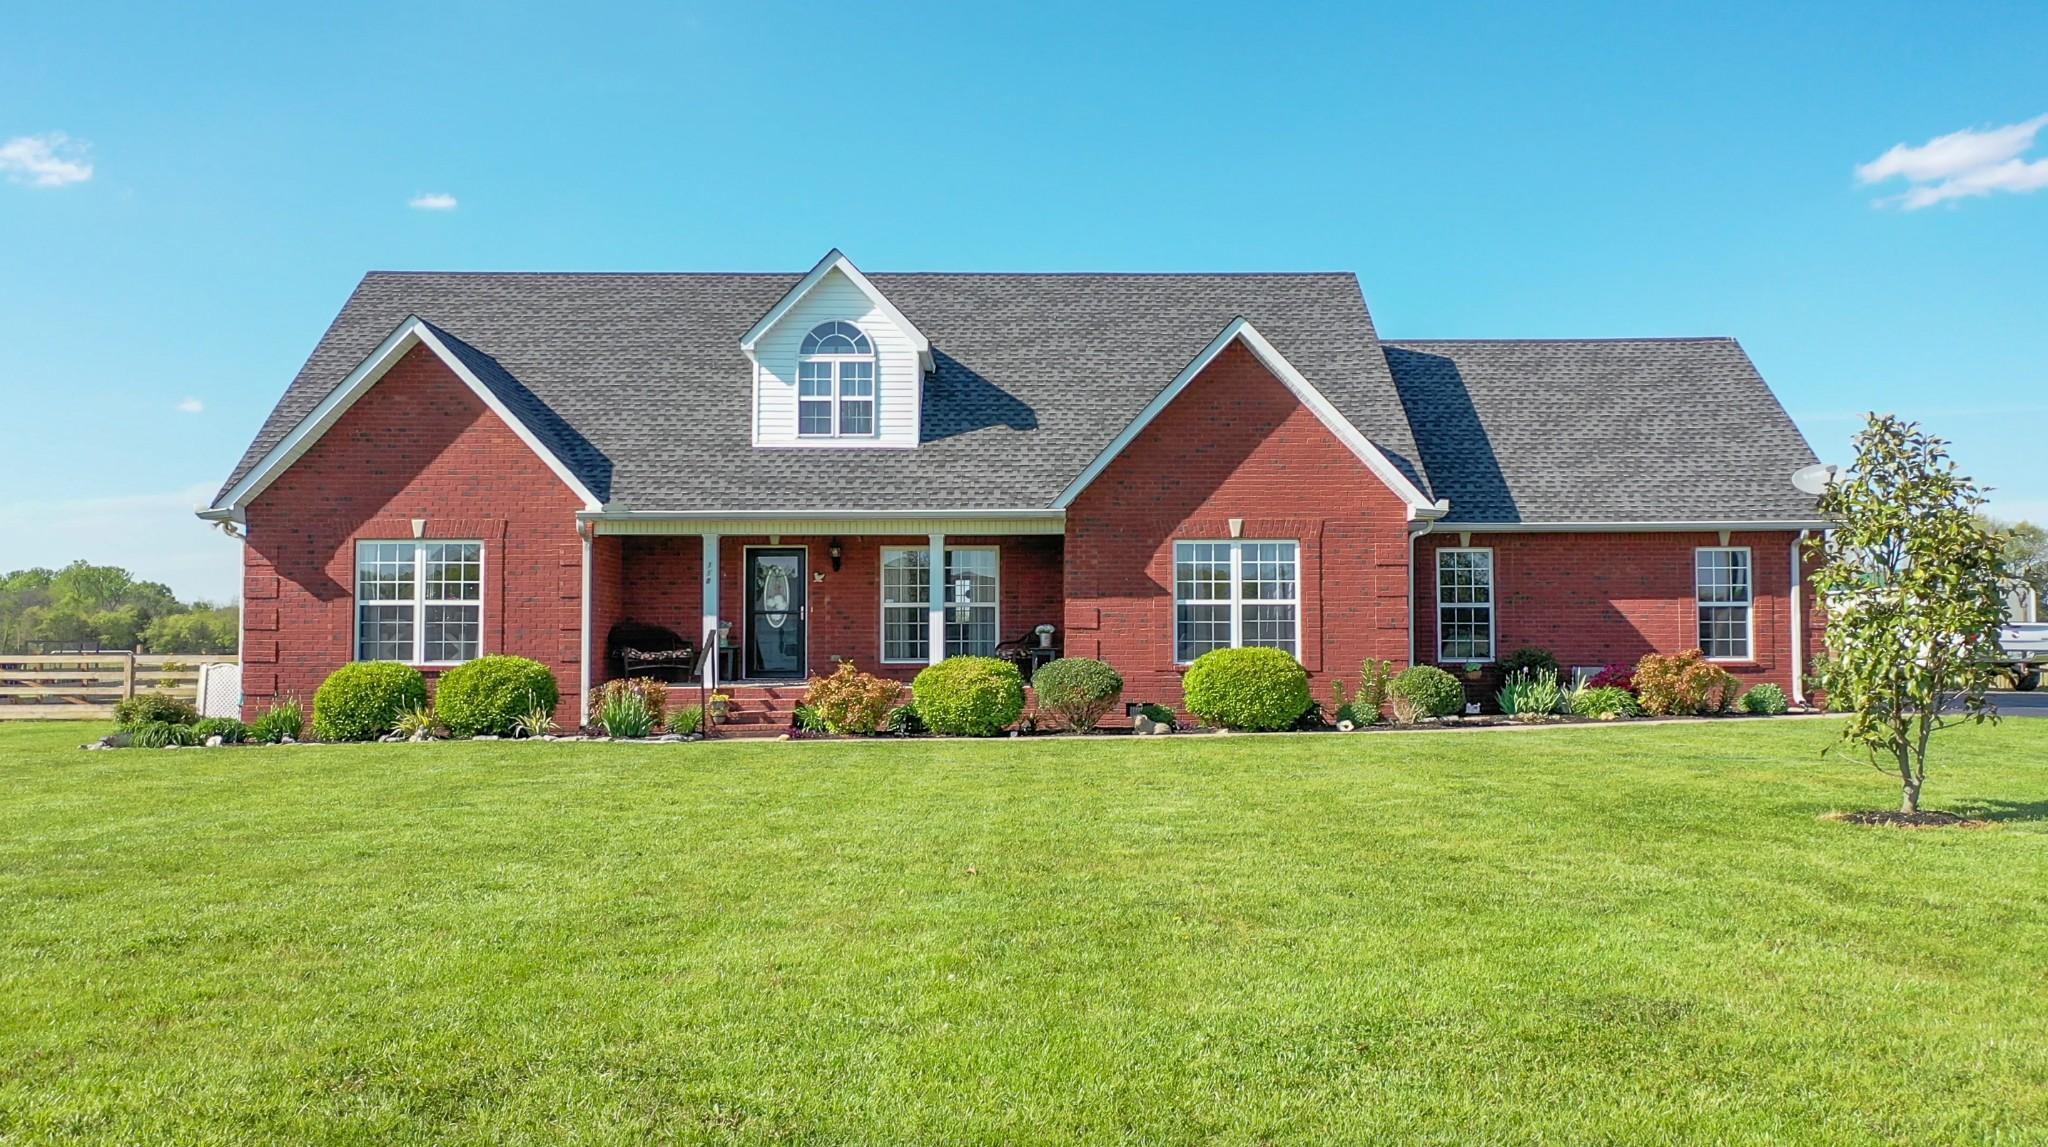 118 Hazelnut Ln Property Photo - Unionville, TN real estate listing